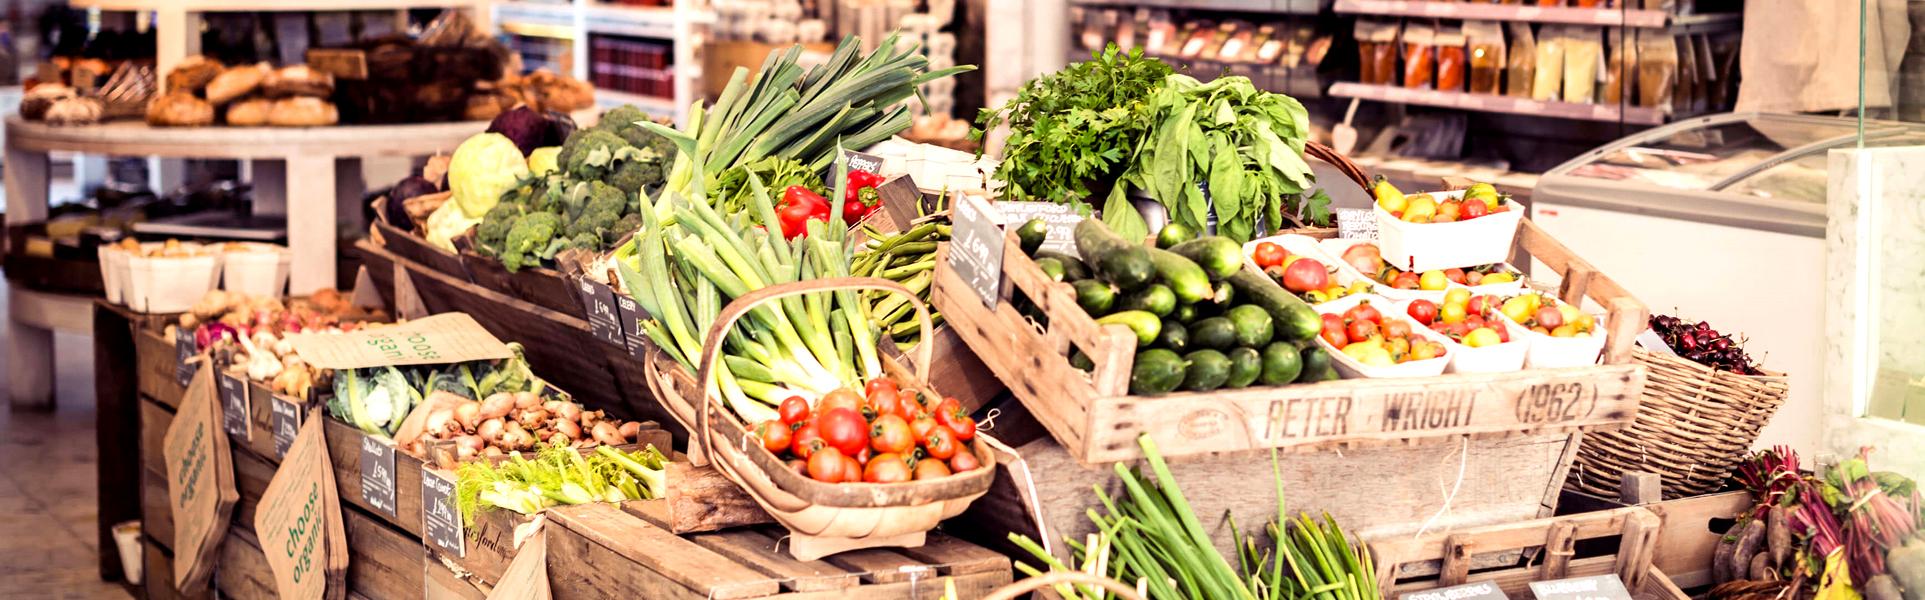 pimlico-market-blog